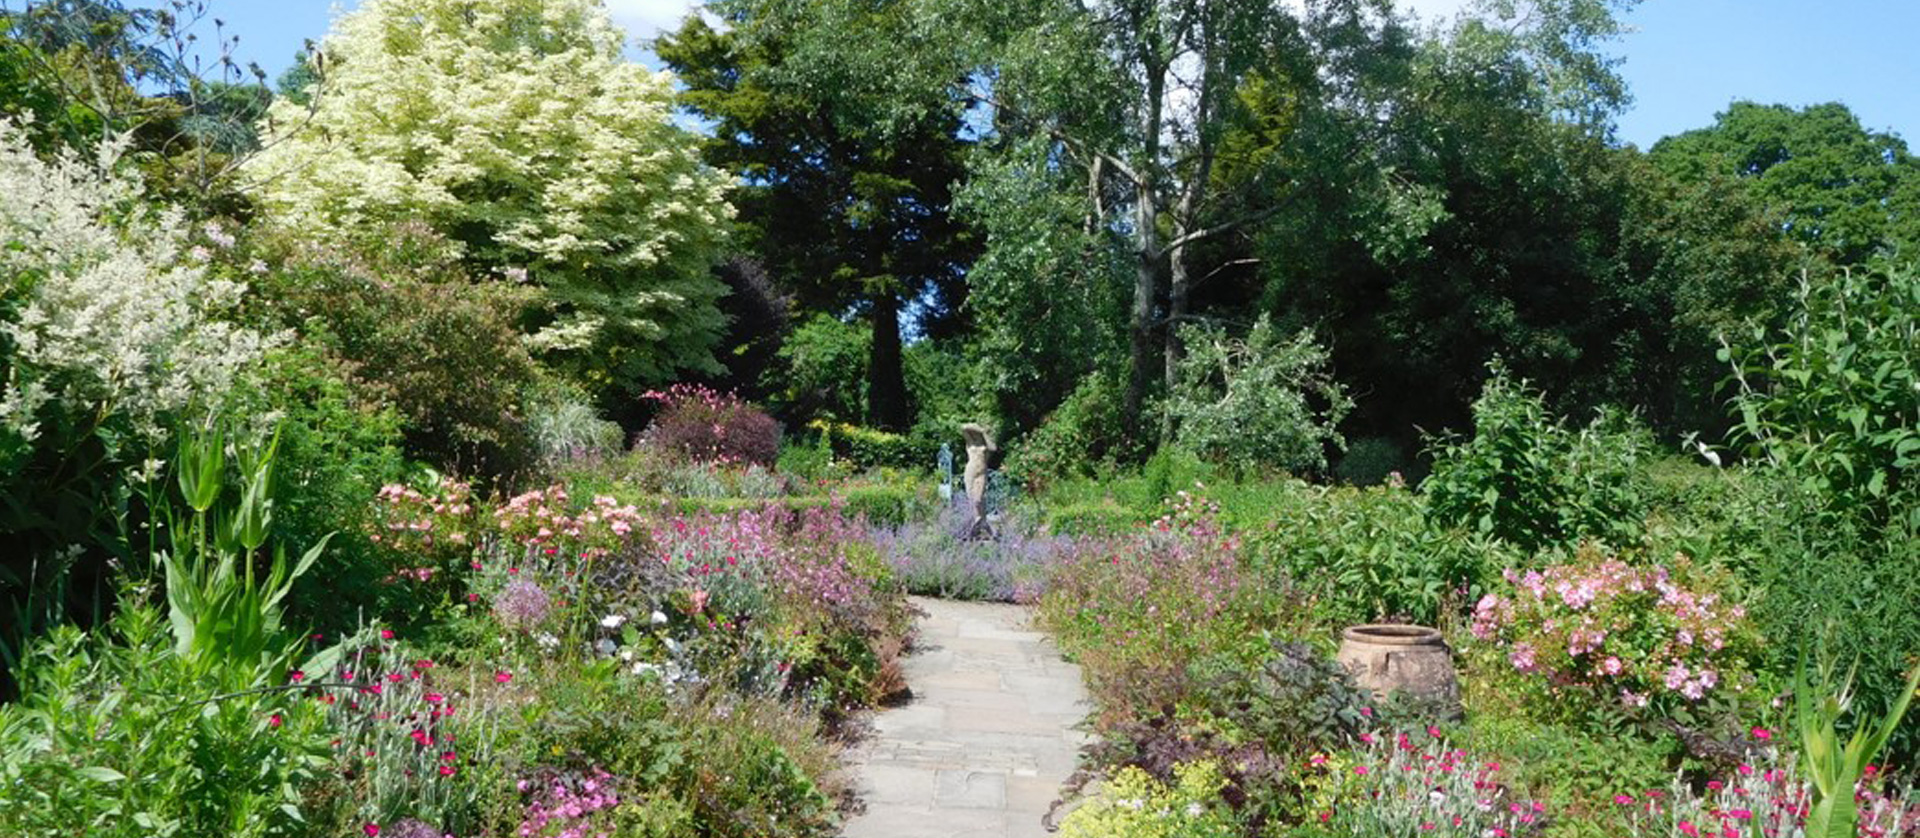 John-Horsey-Horticulture-Garden-History-Devon